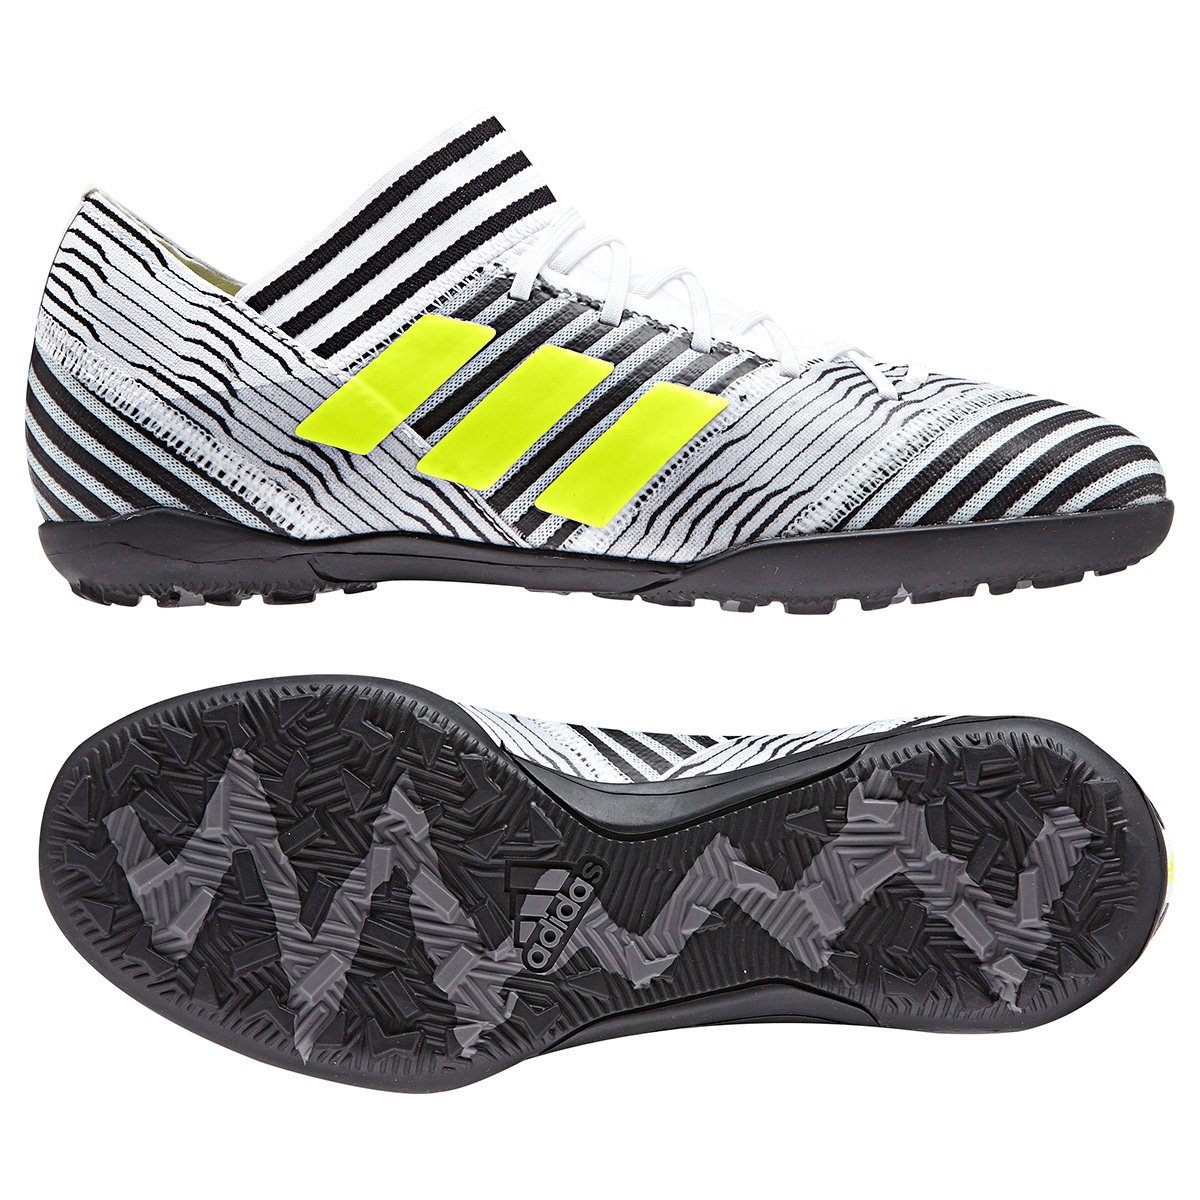 3bf7fb75c0 Chuteira Society Infantil Adidas Nemeziz 17.3 TF - Compre Agora ...